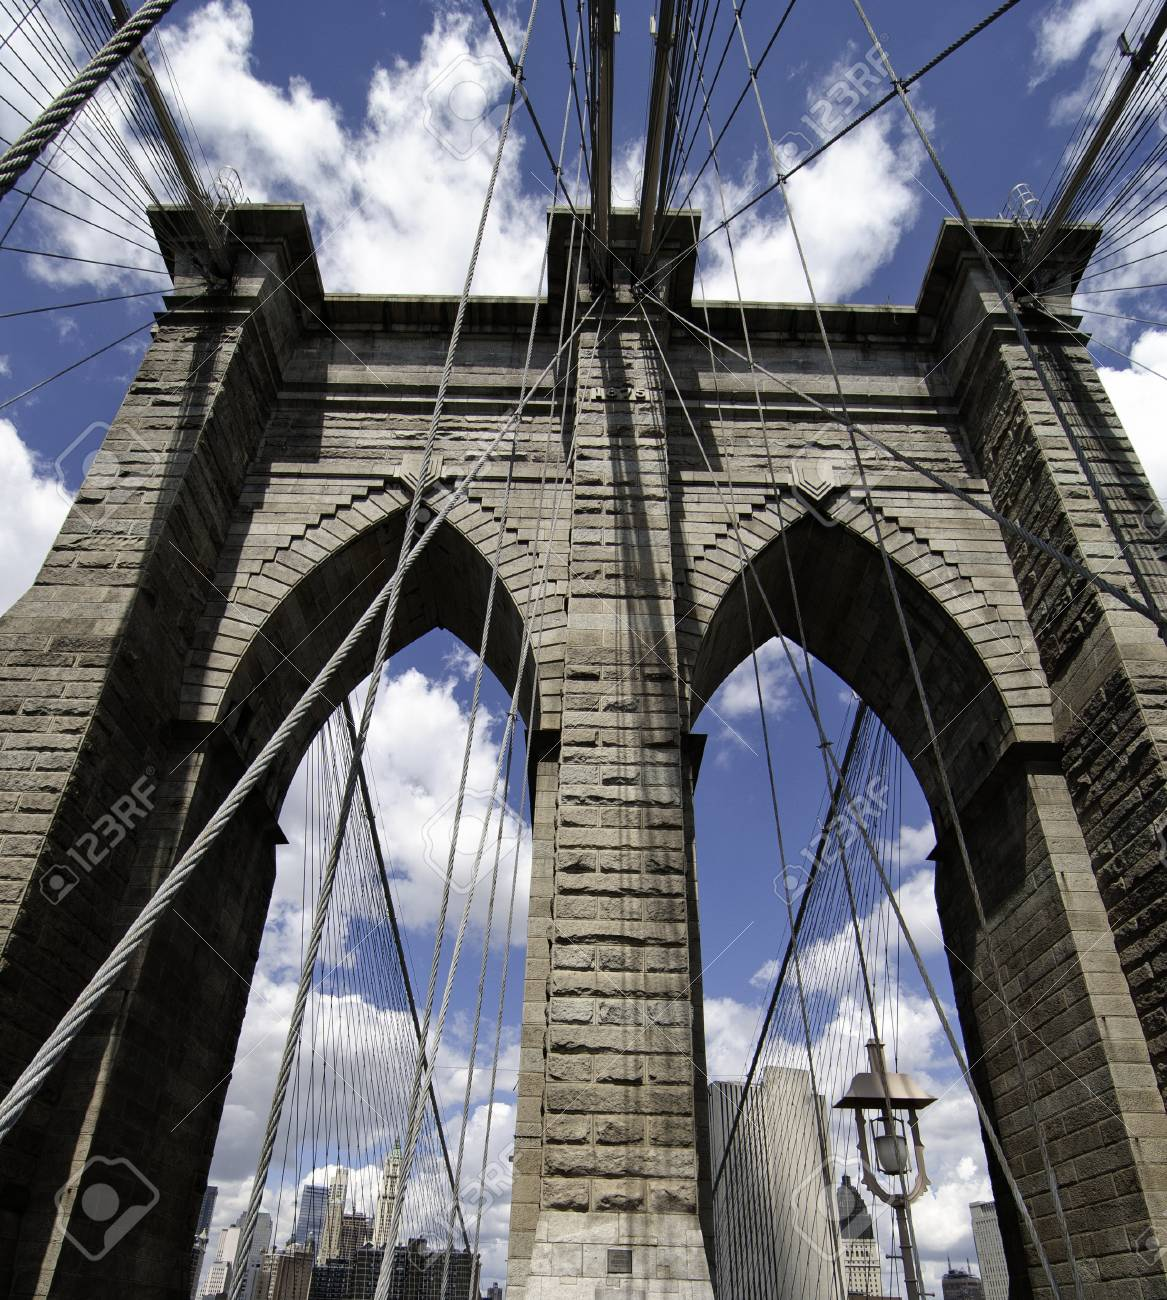 Detail of Brooklyn Bridge in New York City, U.S.A. Stock Photo - 11109181